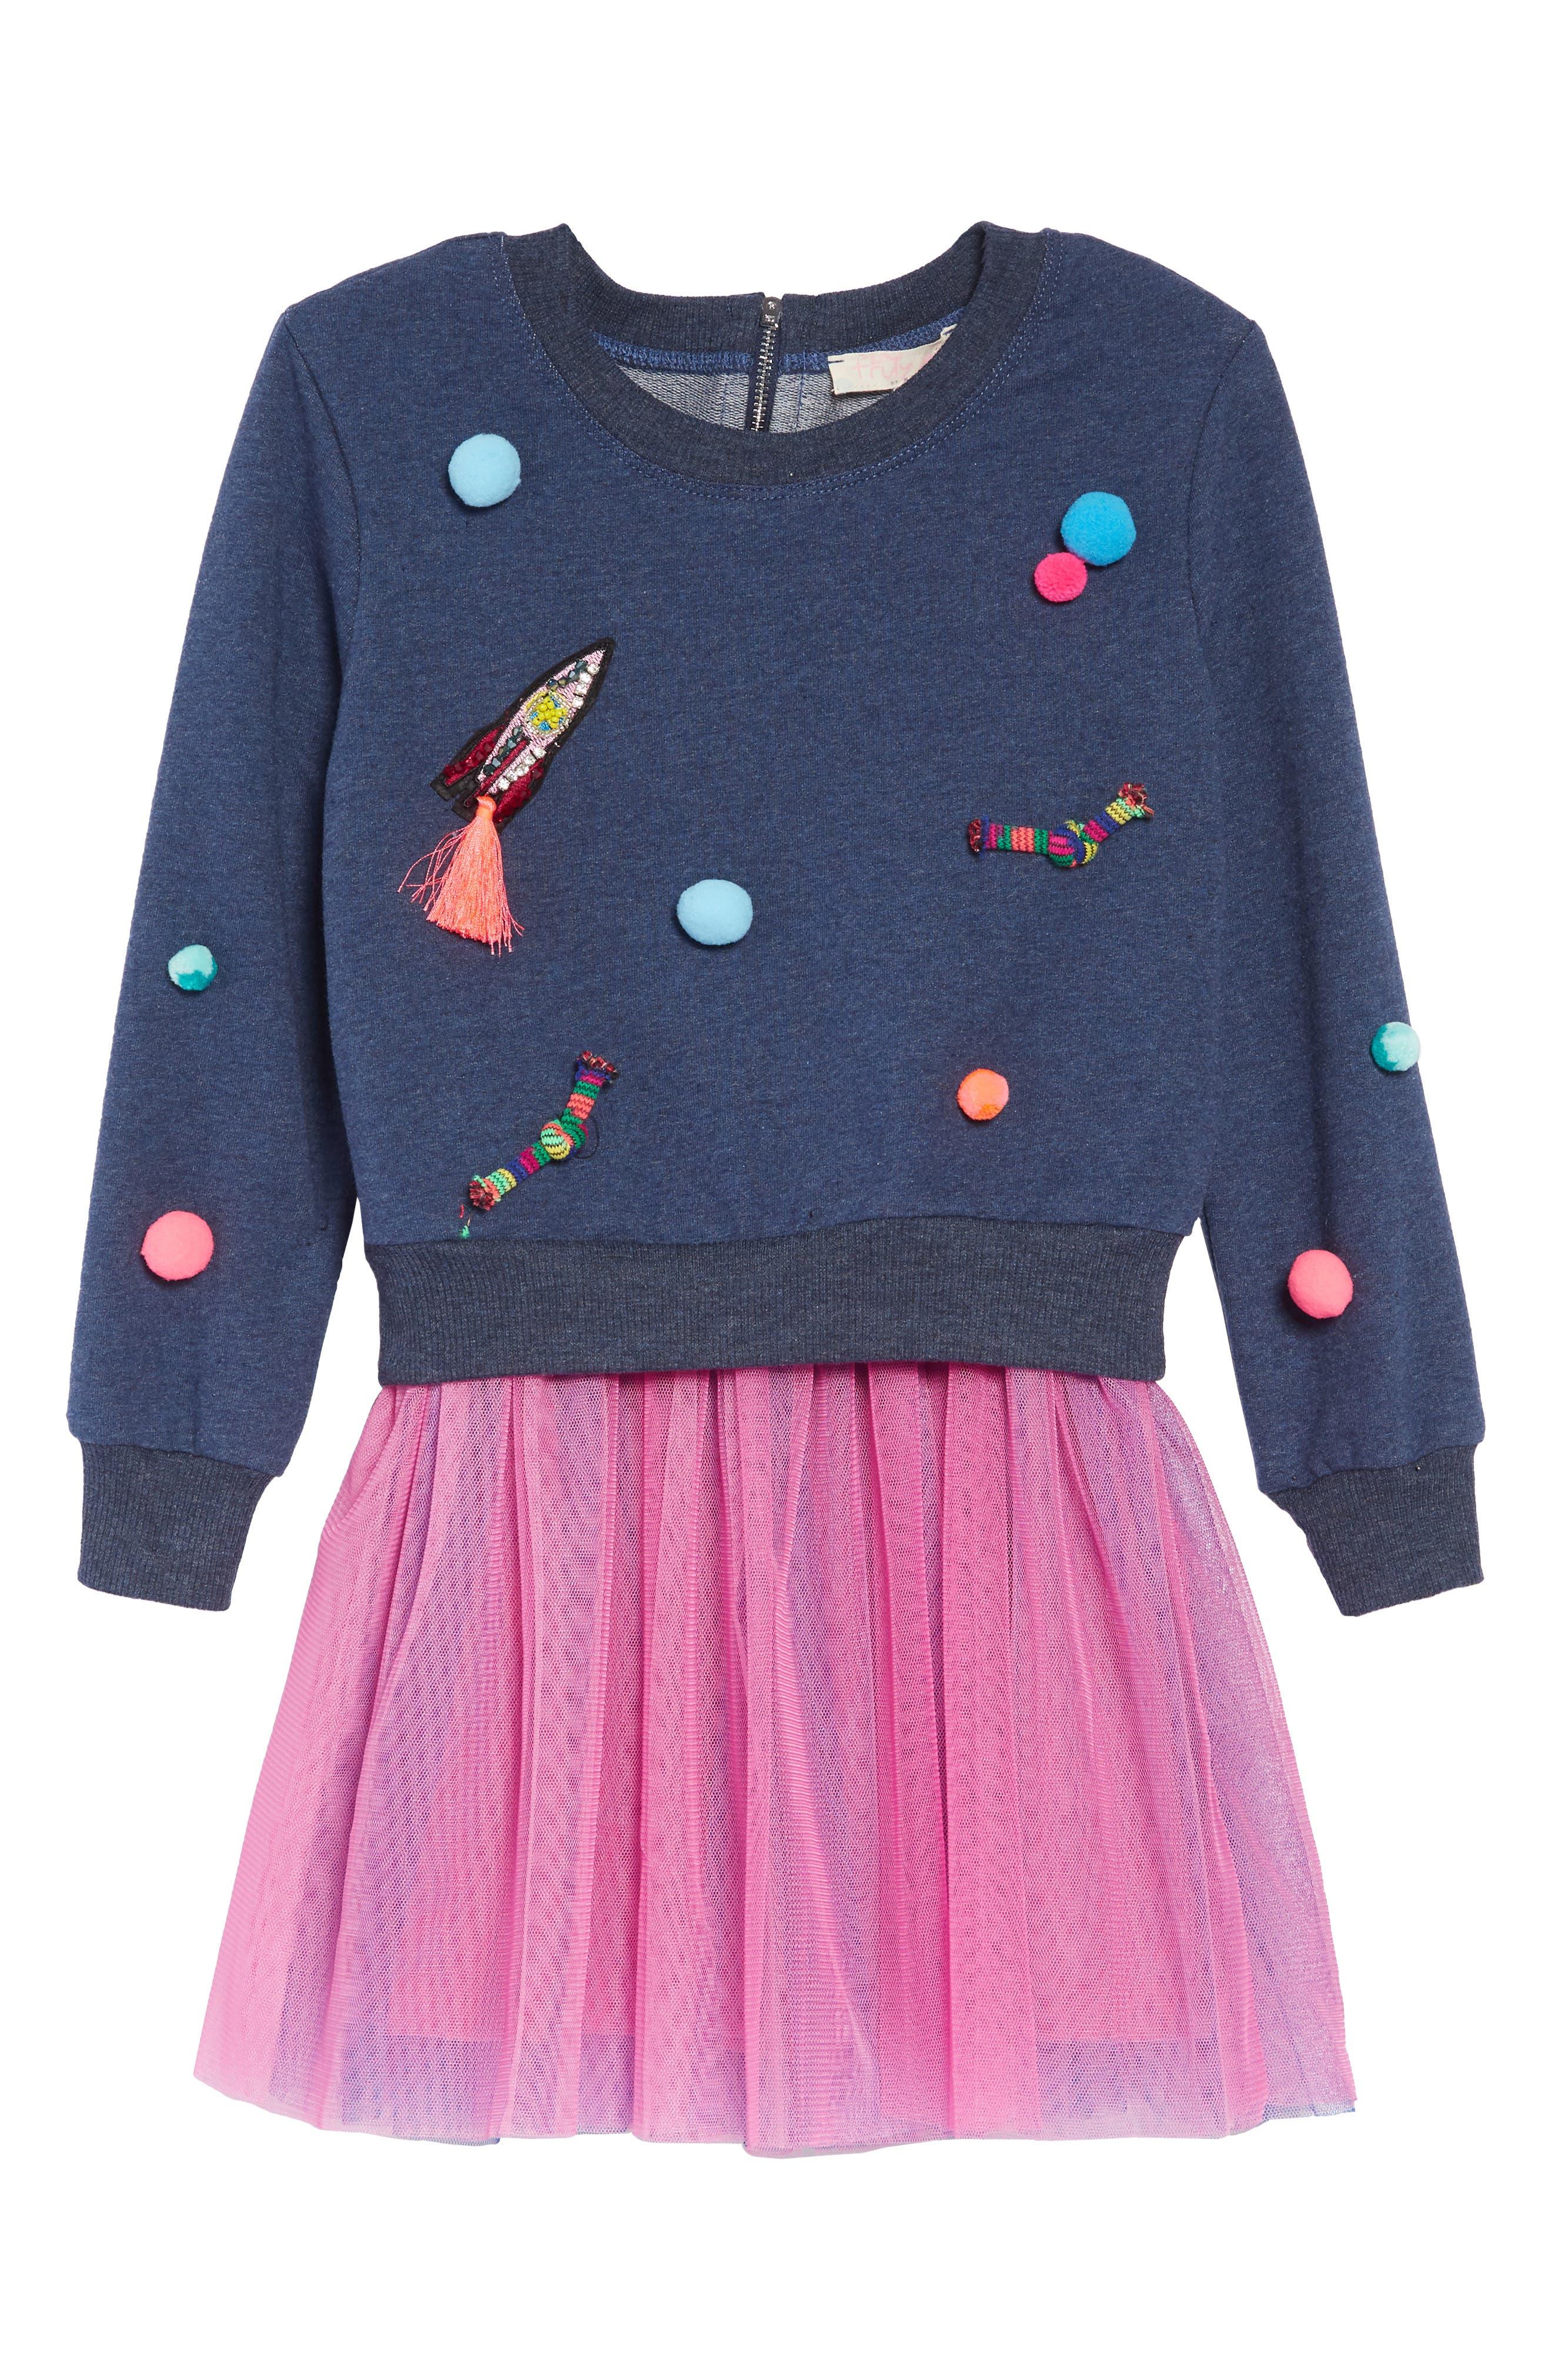 Appliqué Top & Tutu Dress Set,                             Alternate thumbnail 2, color,                             NAVY-PINK